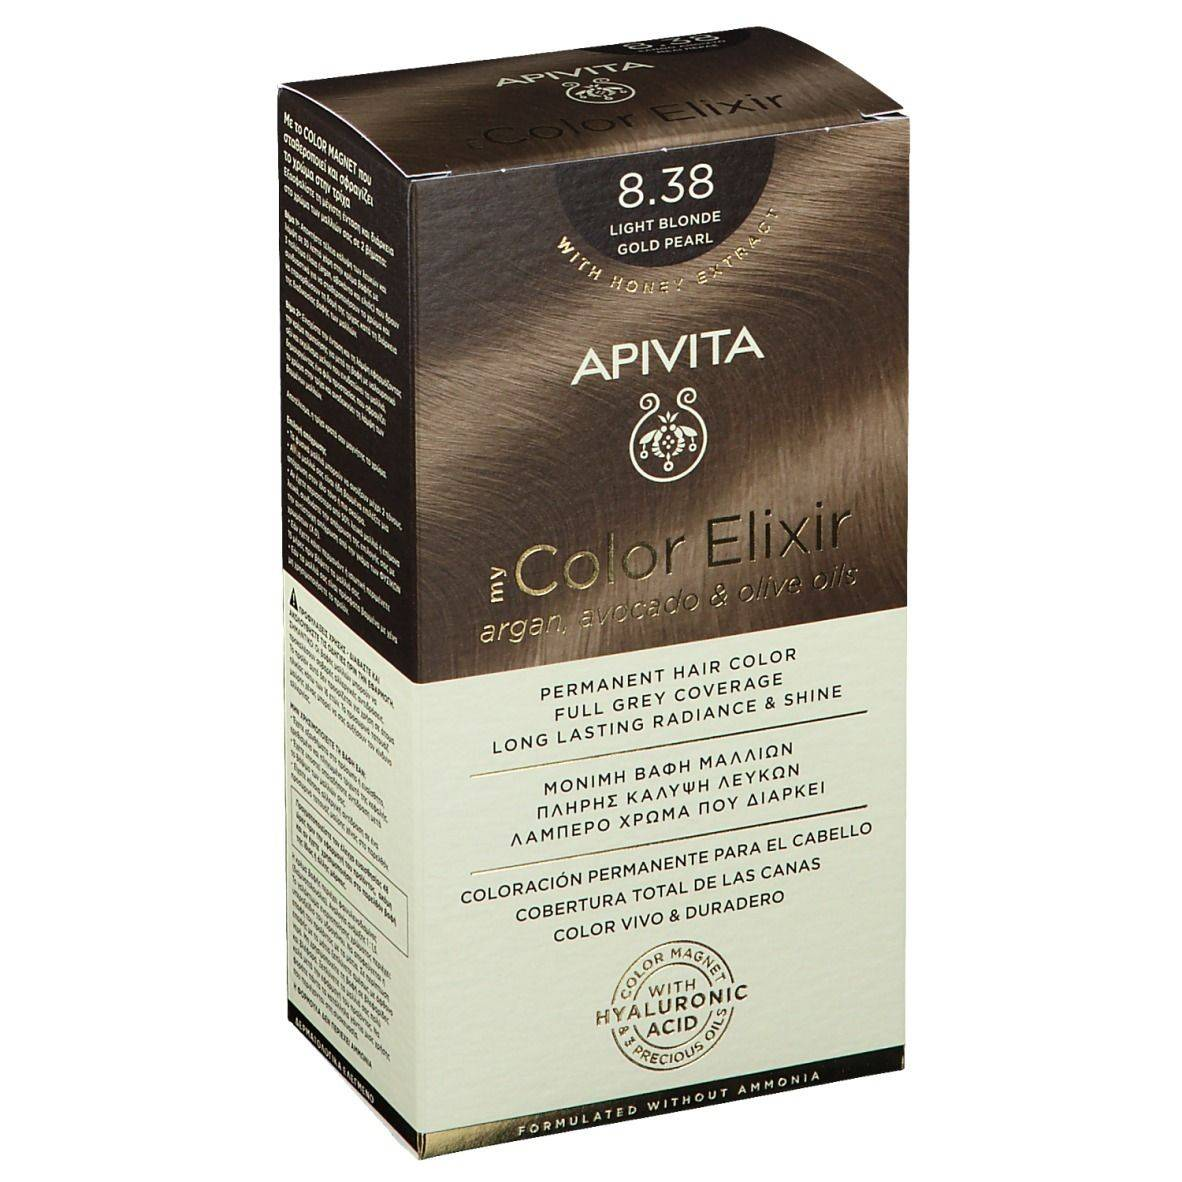 APIVITA My Color Elixir 8.38 Blond claire Gold Pearl ml élixir